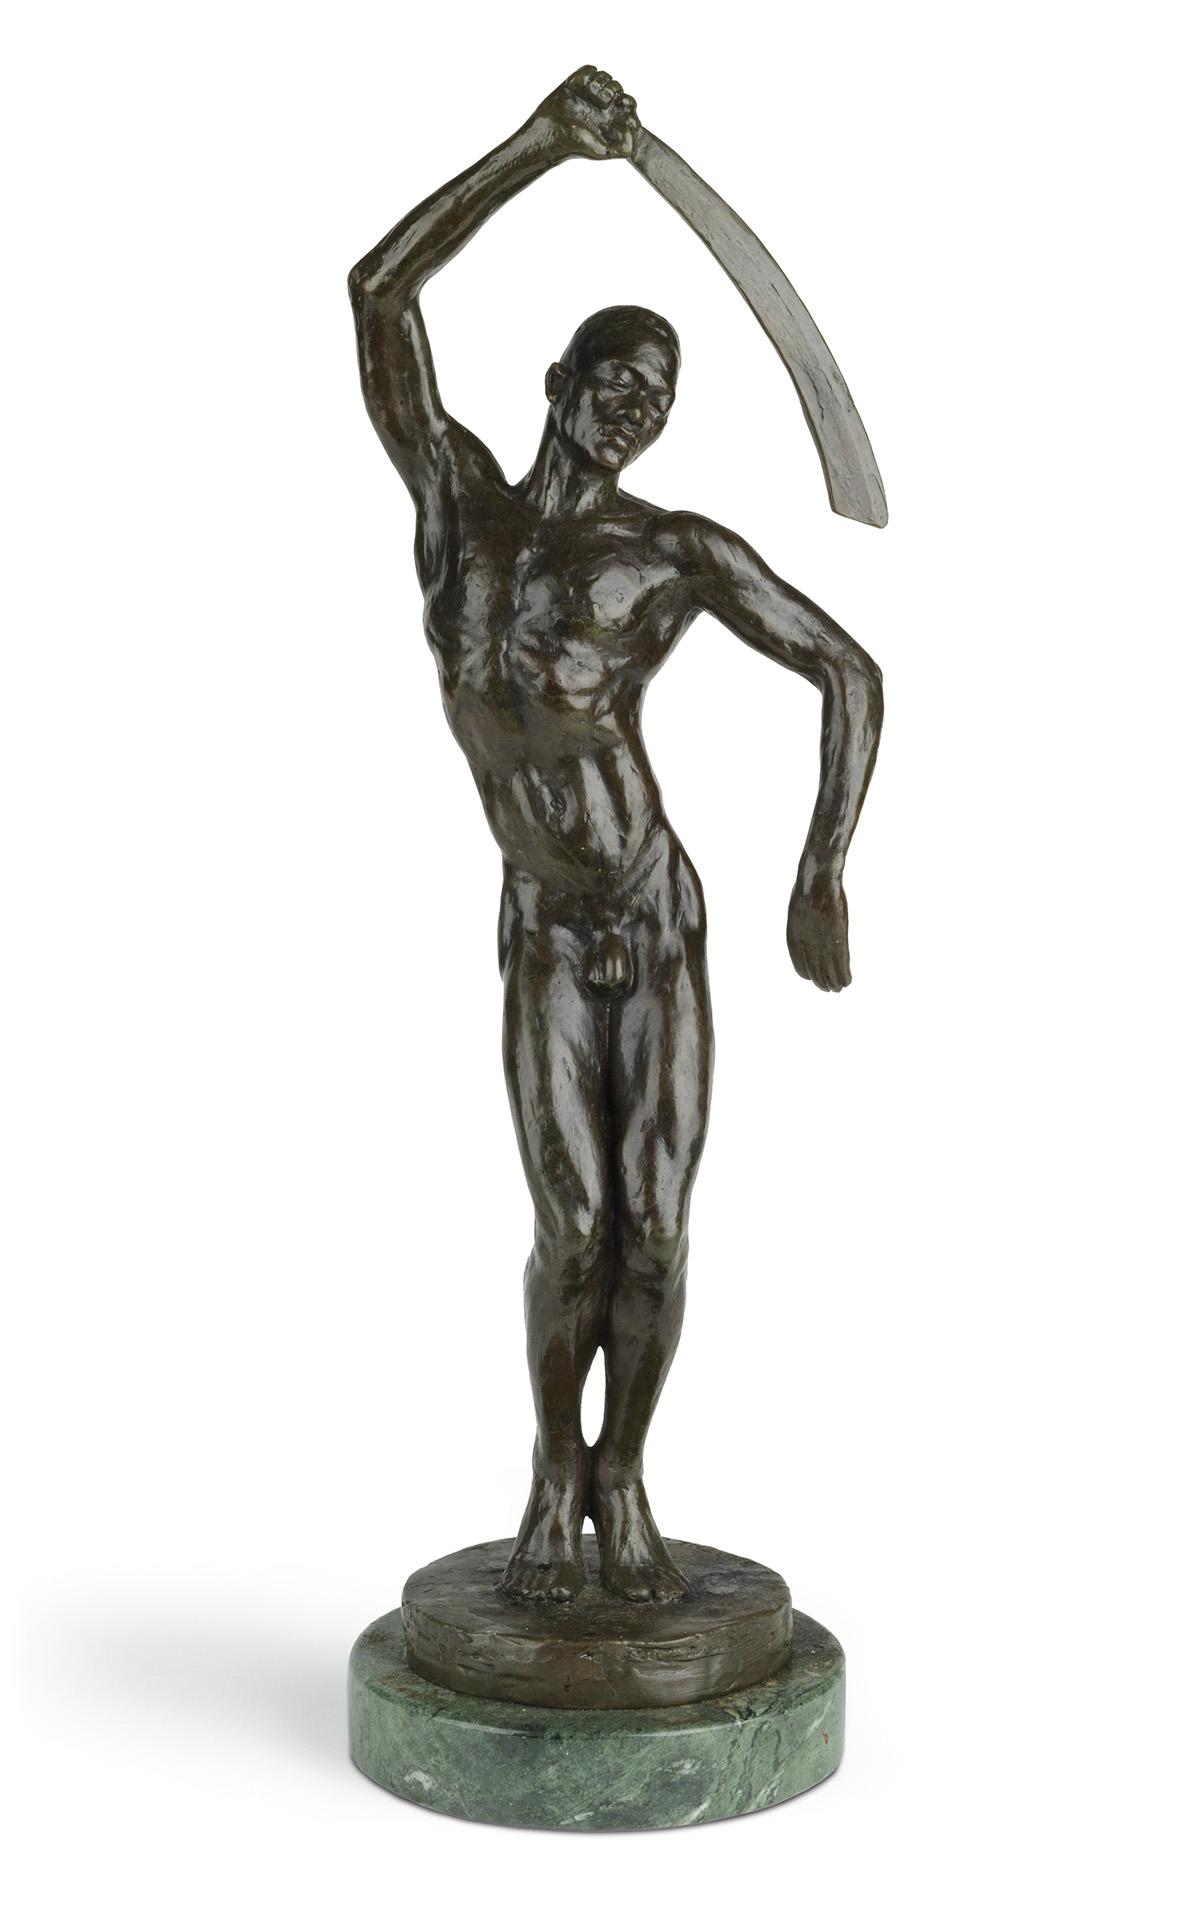 Richmond Barthé sculpture titled Féral Benga